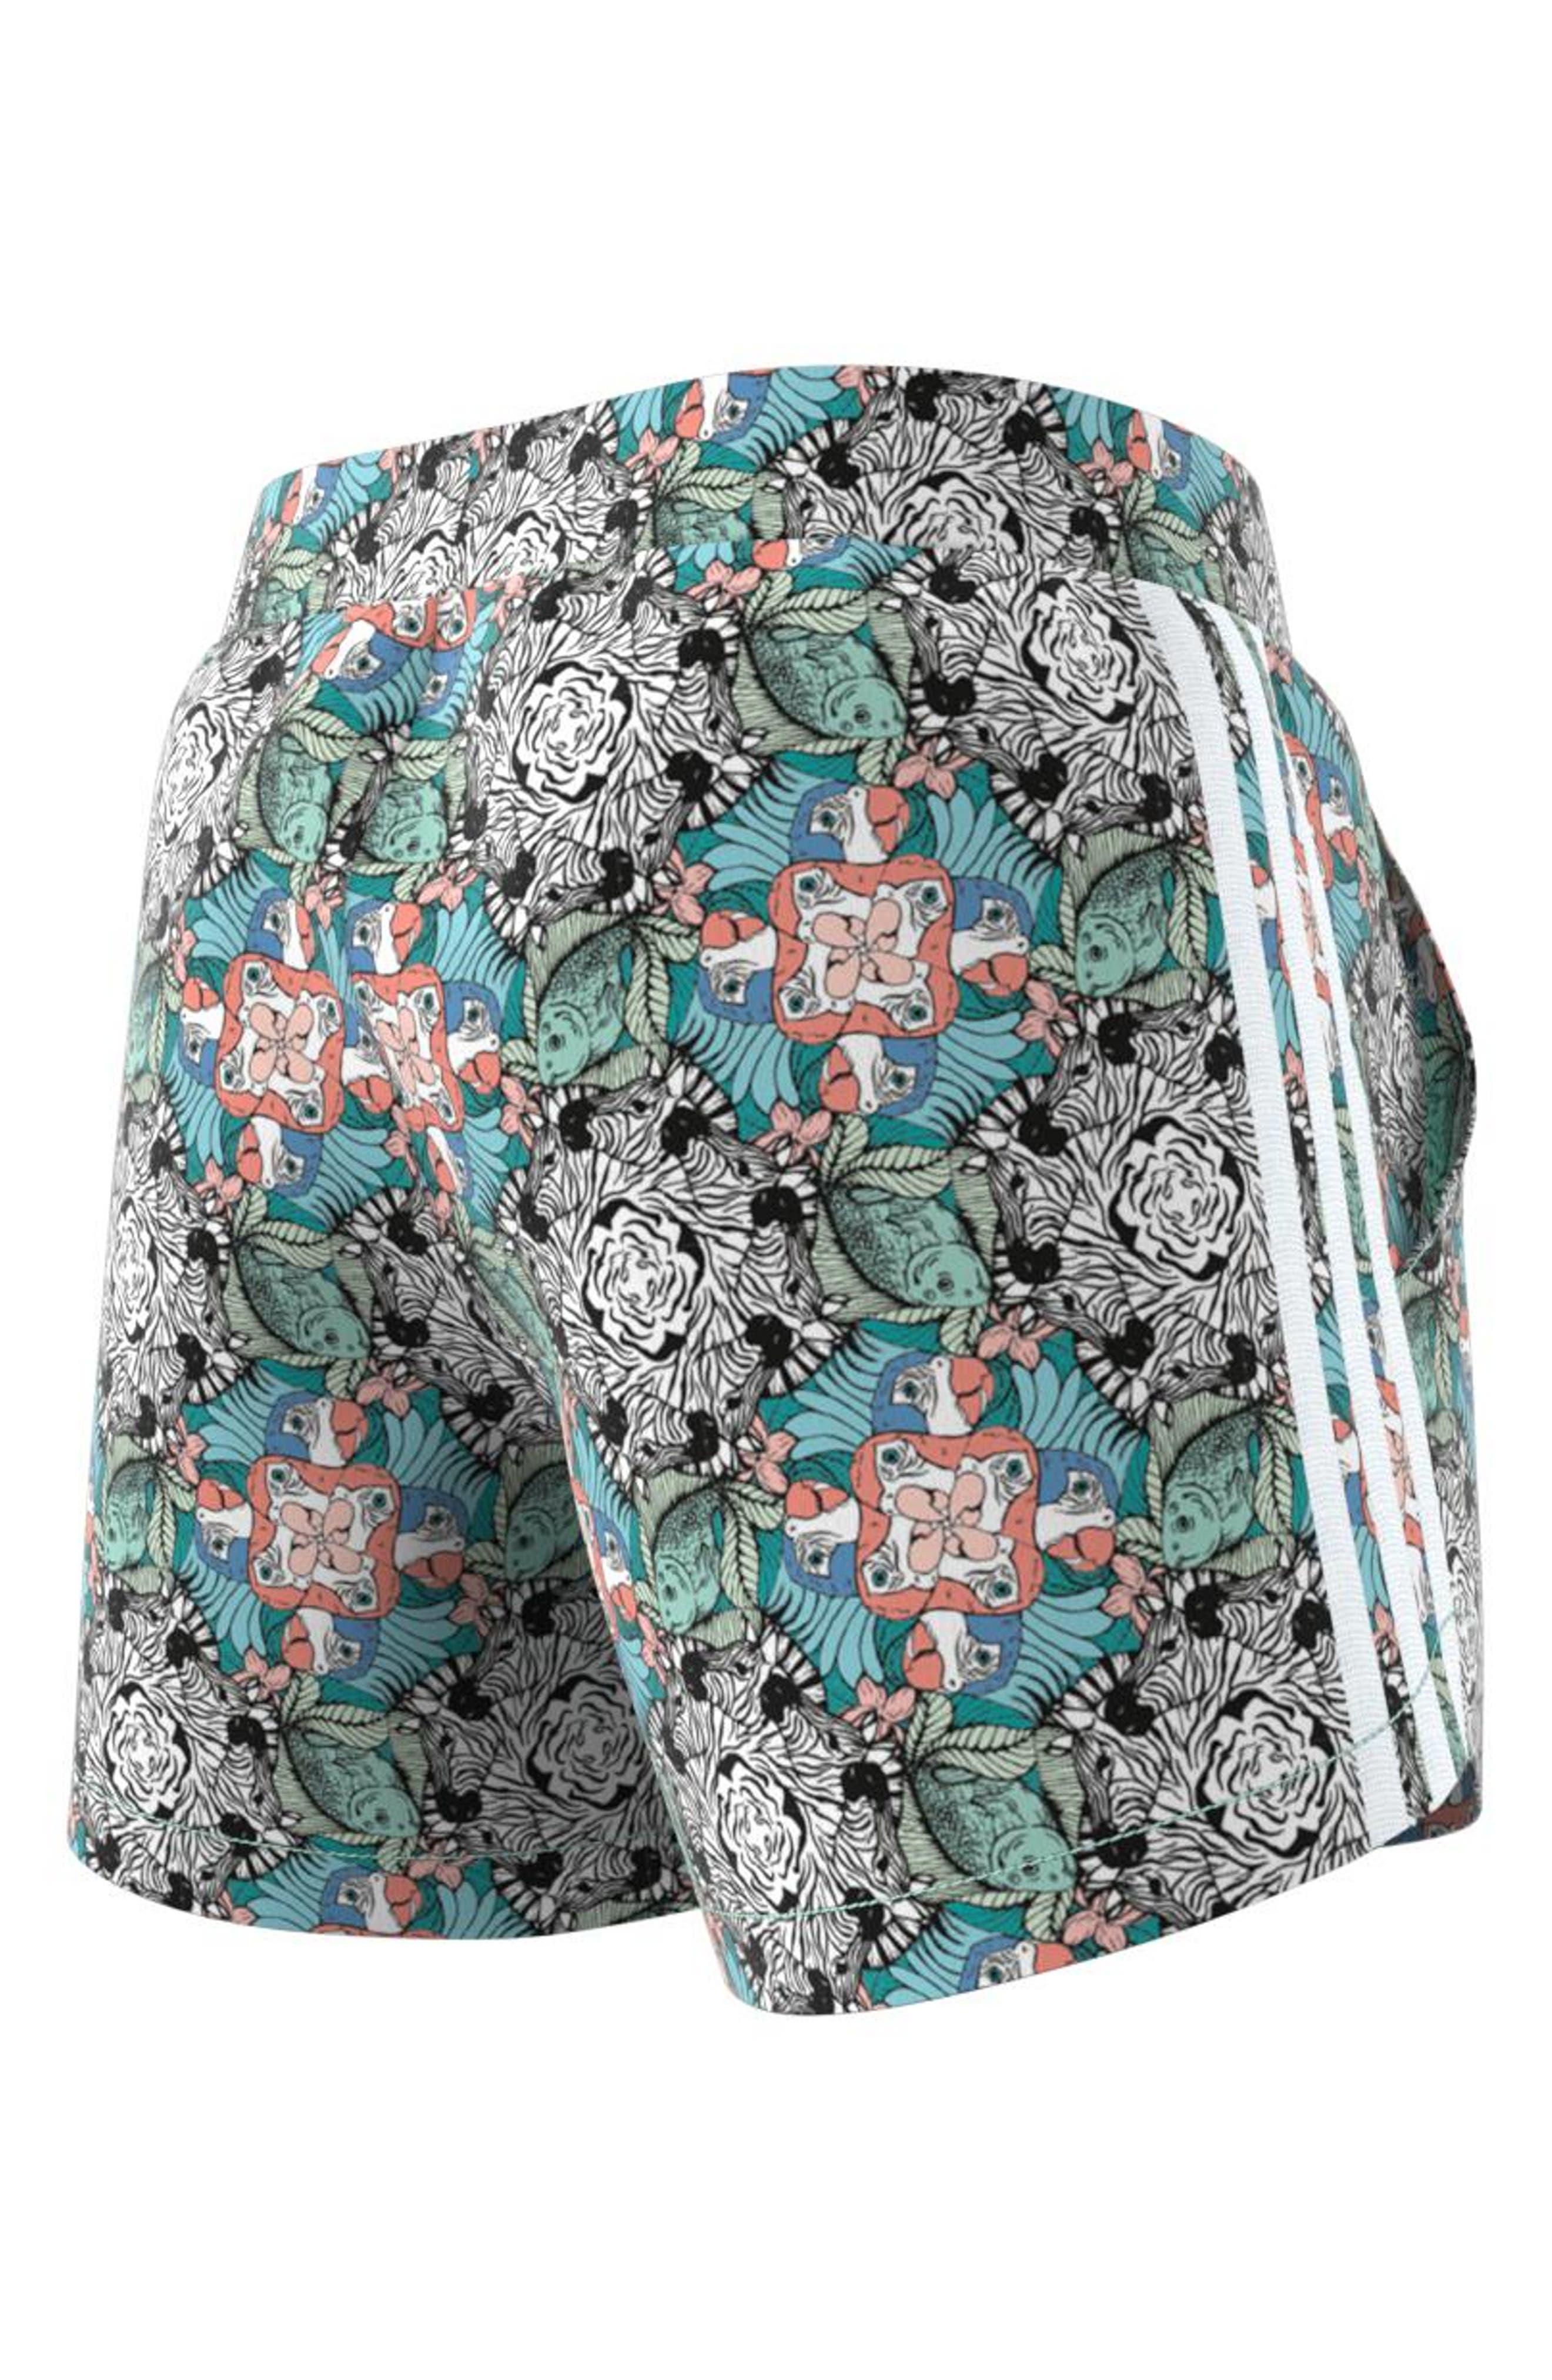 Zoo Shorts,                             Alternate thumbnail 8, color,                             MULTI-COLOR / WHITE